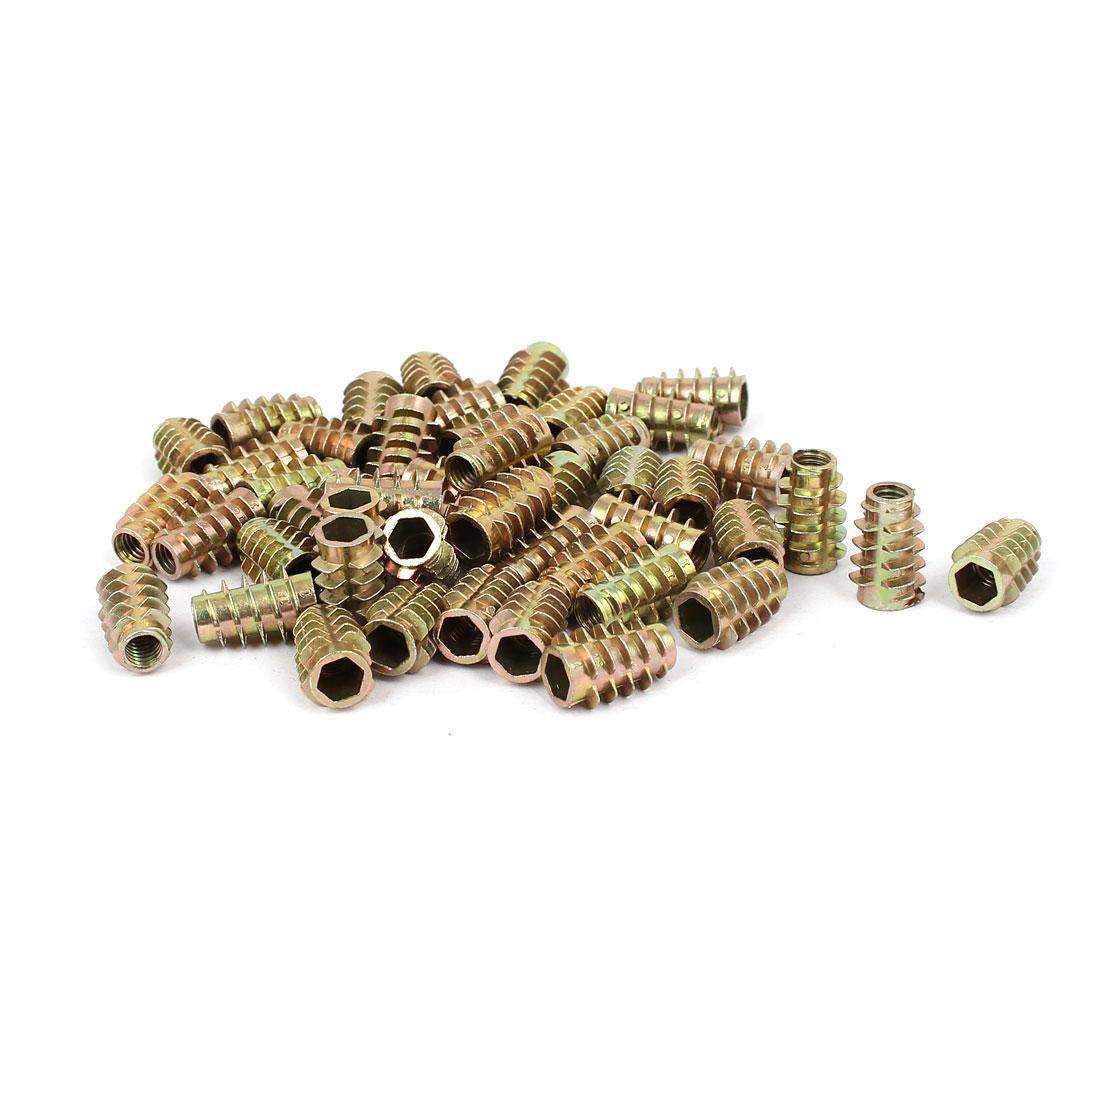 Wood Furniture Zinc Alloy Hex Socket Insert Screws E-Nuts M6x18mm 50pcs